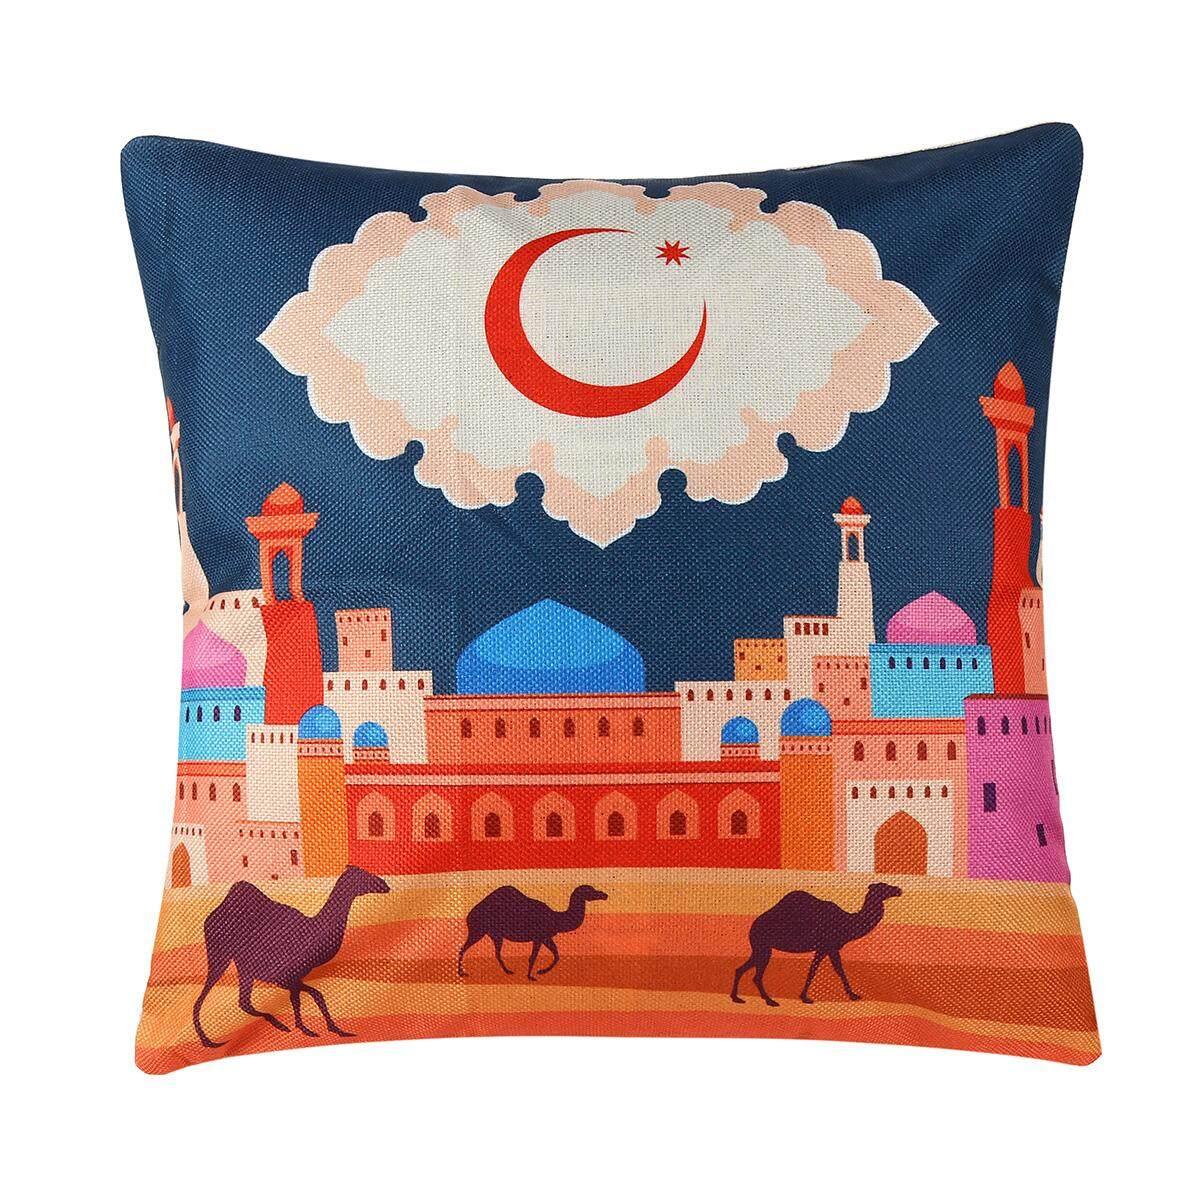 Cushion Pillow Case Islam Muslim Eid Ramadan Home Decor 45cm*45cm/18*18 By Freebang.